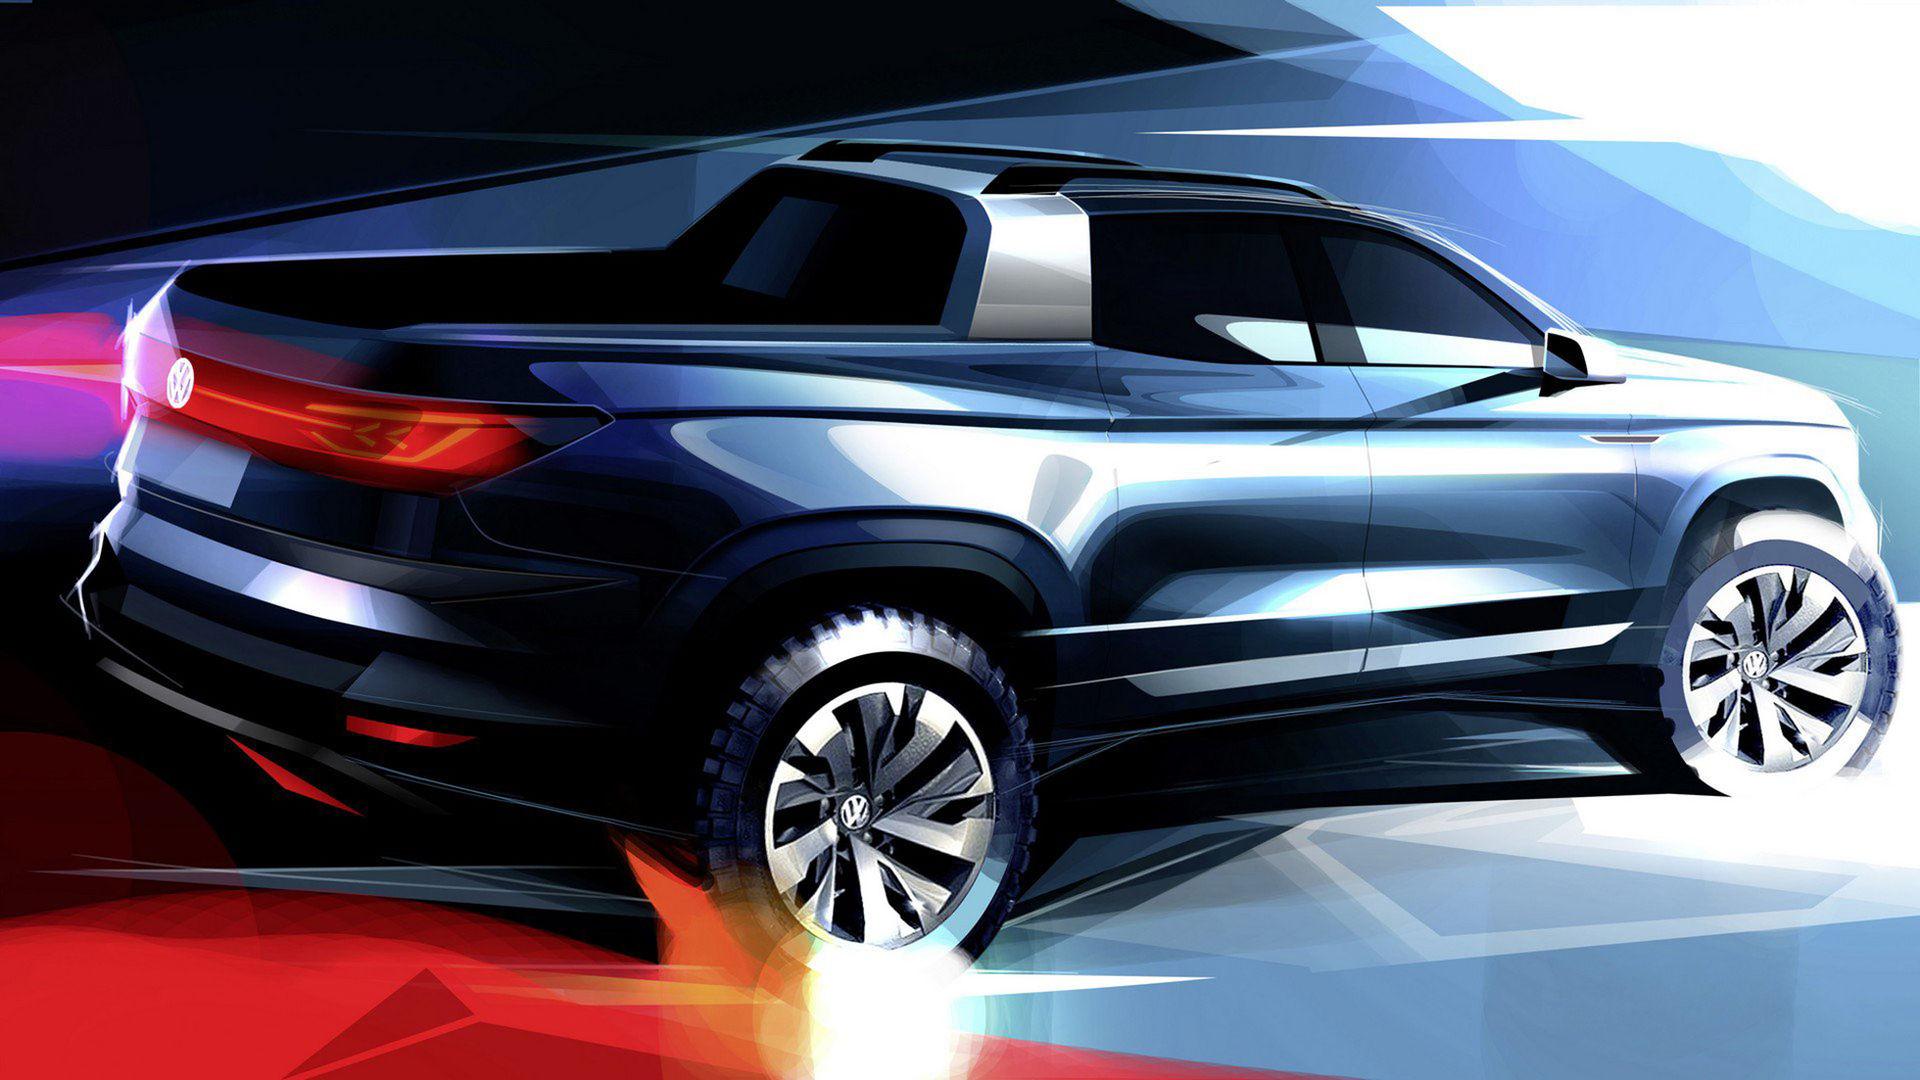 Volkswagen släpper teaserbild på mindre pickup